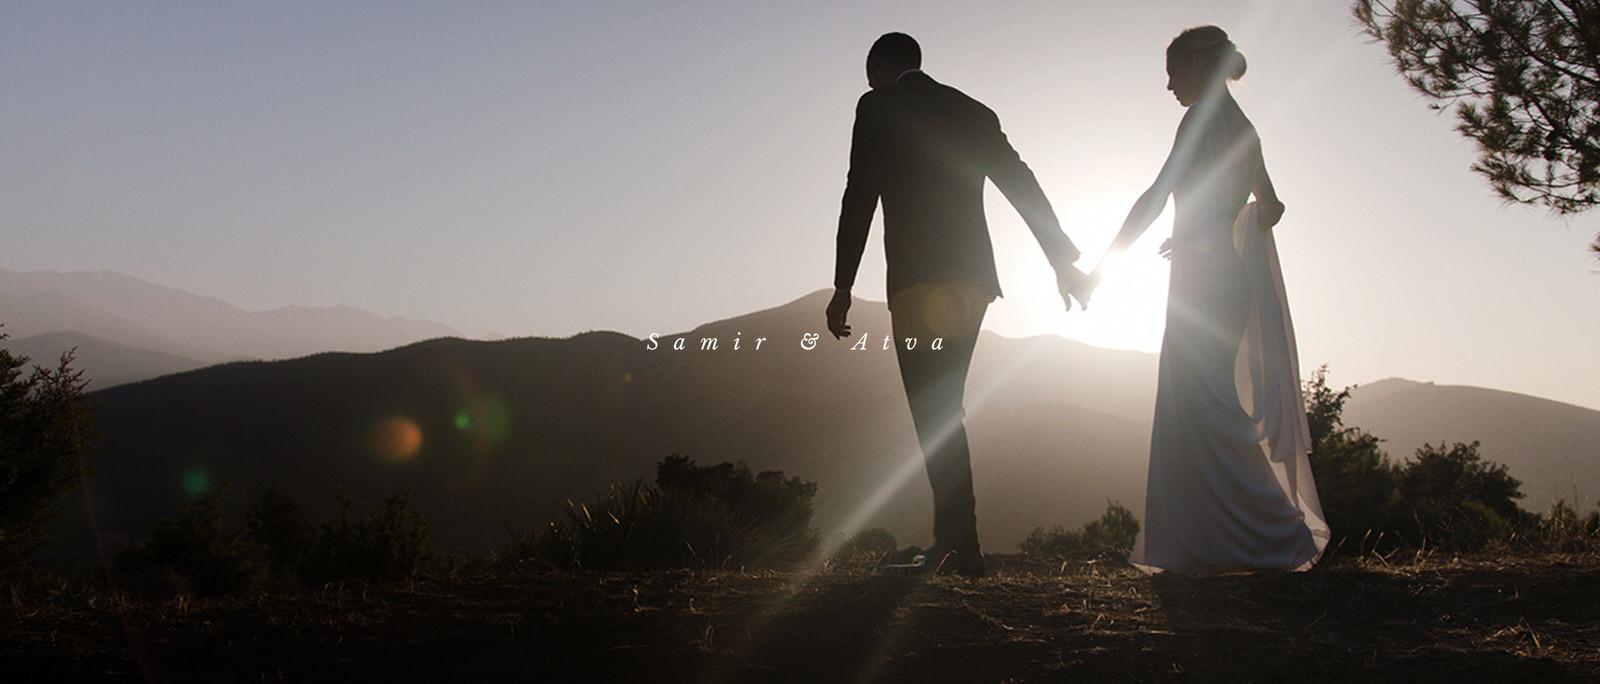 samir-atva-morocco-marokko-essaouira-wedding-film-video-dreamers-ursa-mini-bmpcc4k-blackmagic-trouwfilm-videograaf-amsterdam-atlas-kasbah-bab-ourika-1-1